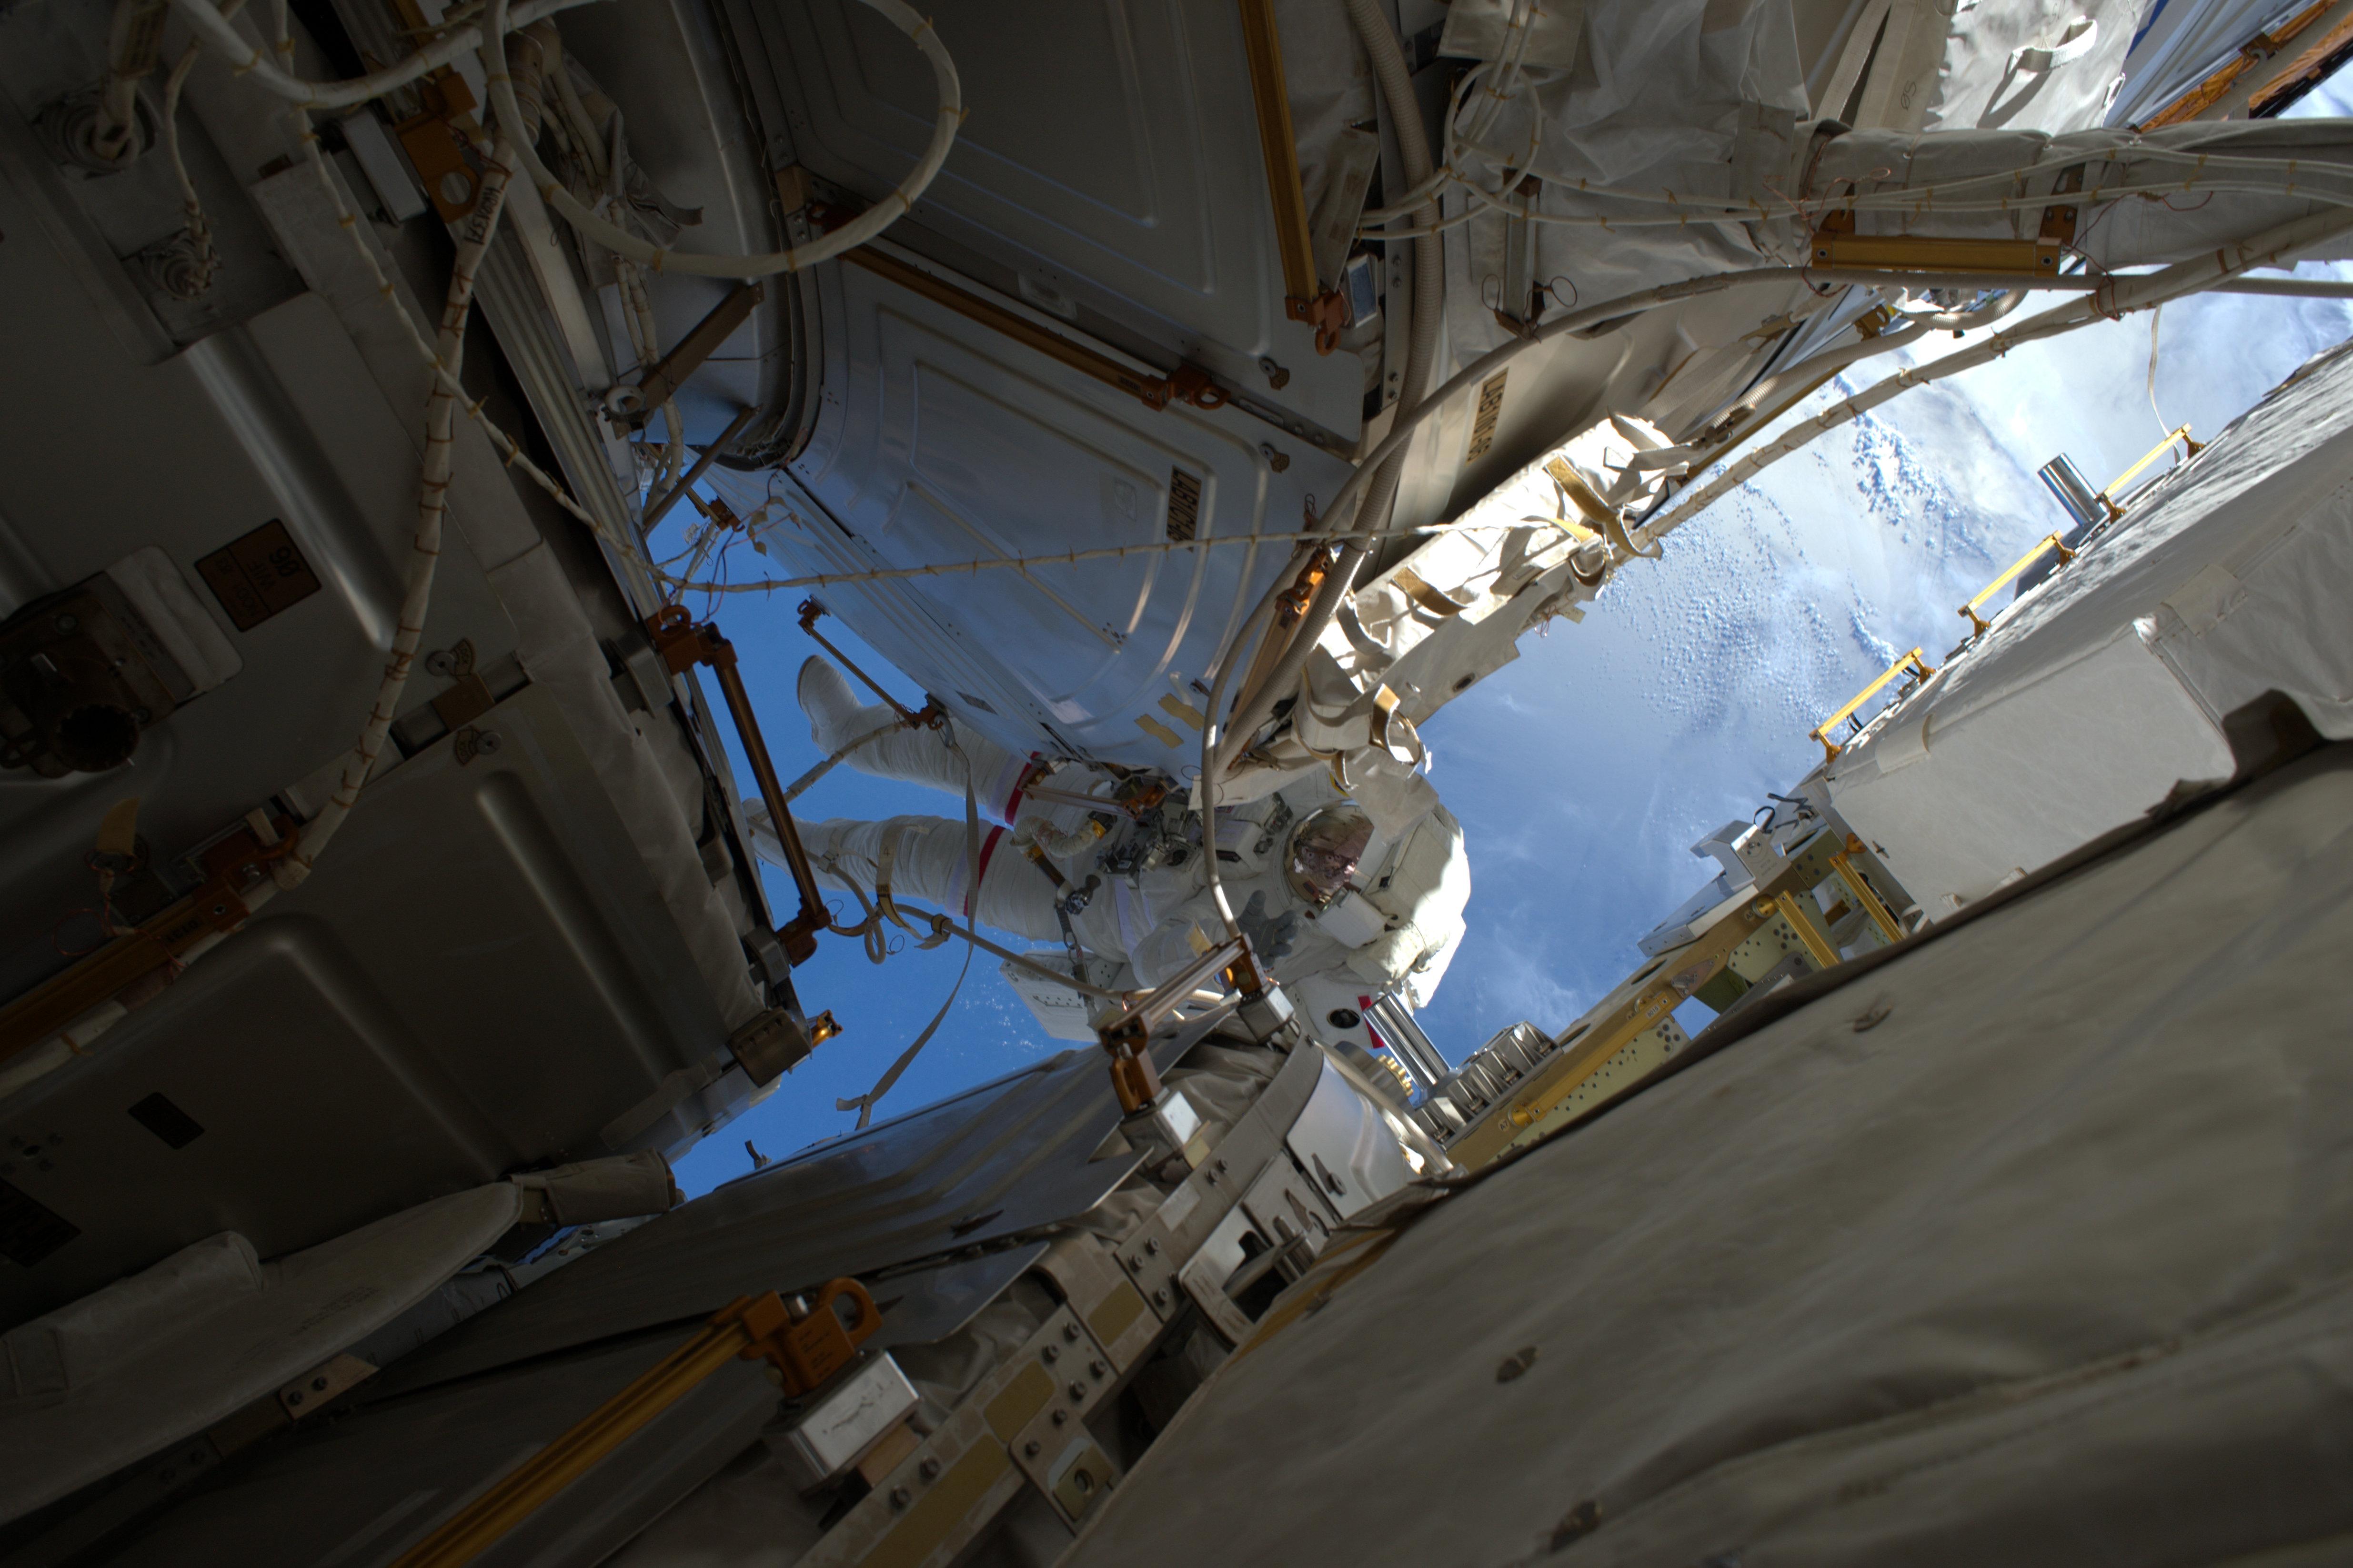 NASA Astronaut Shane Kimbrough on Jan. 13 Spacewalk